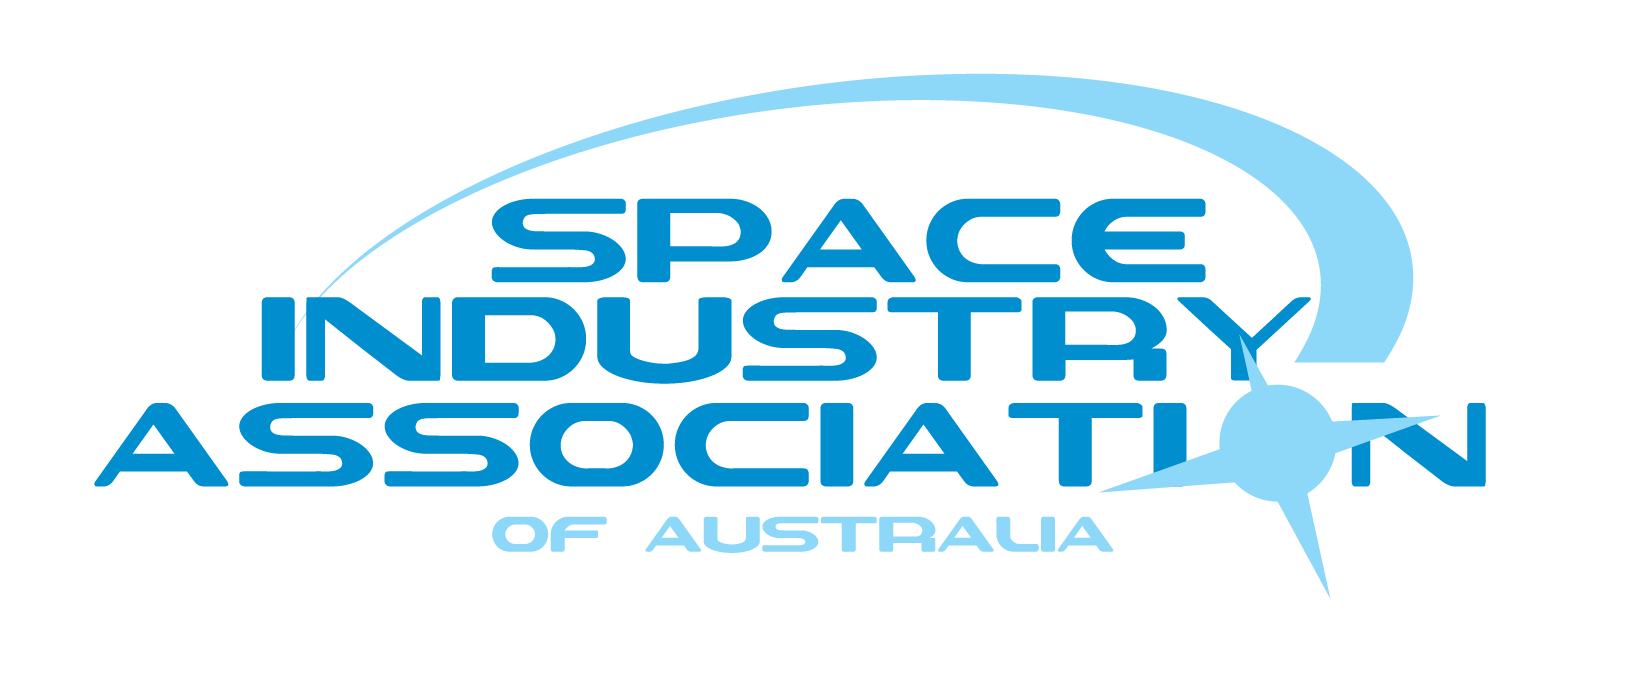 Space Industry Association Aus logo